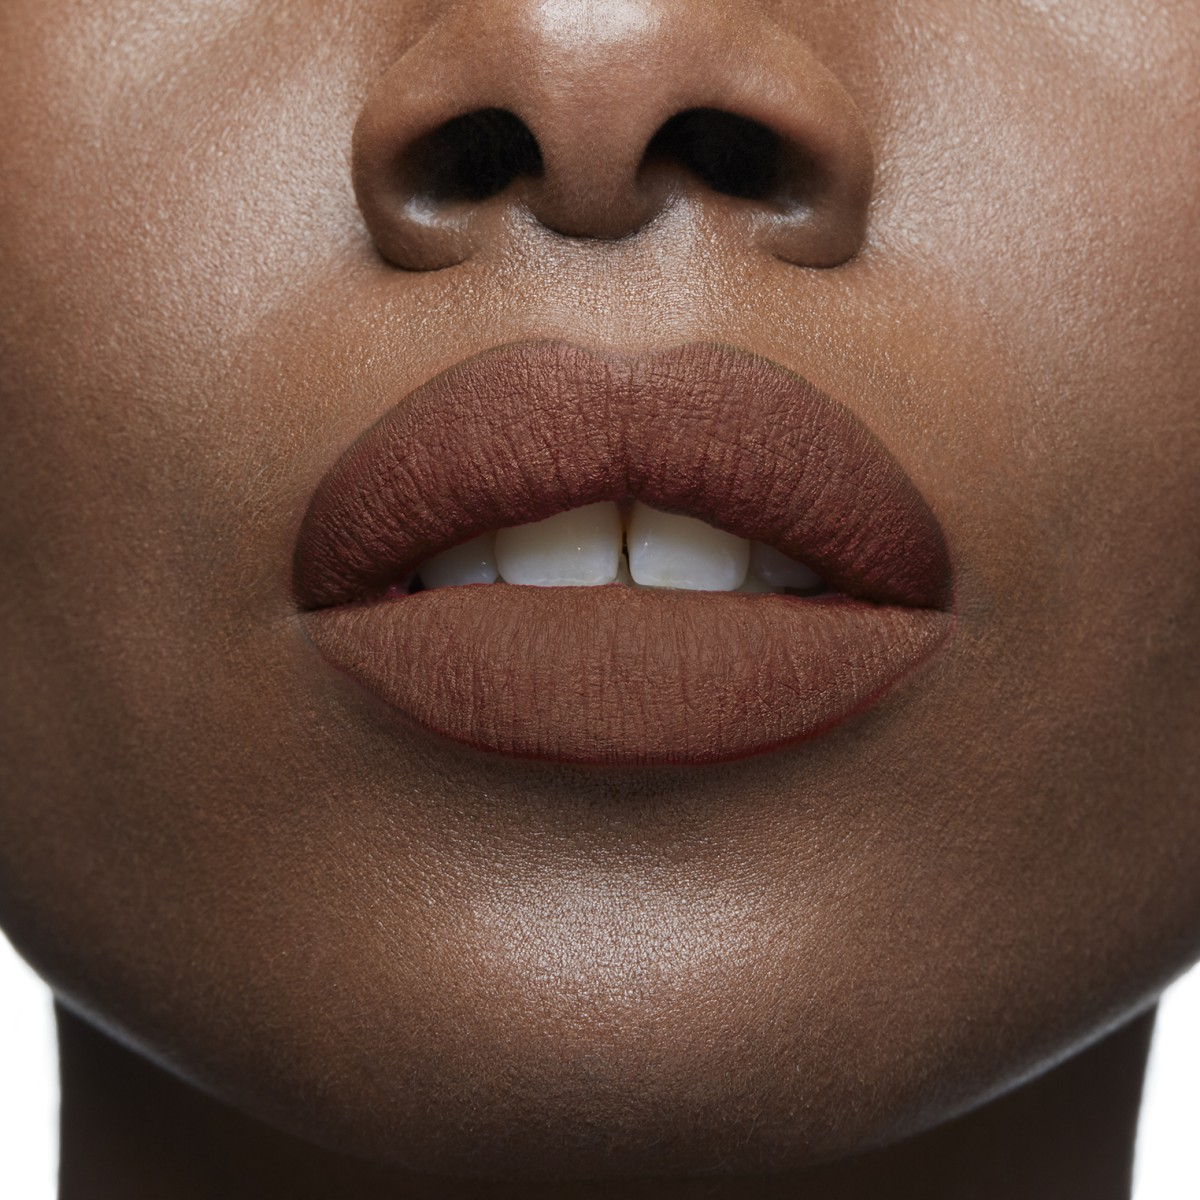 Woman Beauty - リップカラー ズウルウ 715m - Christian Louboutin